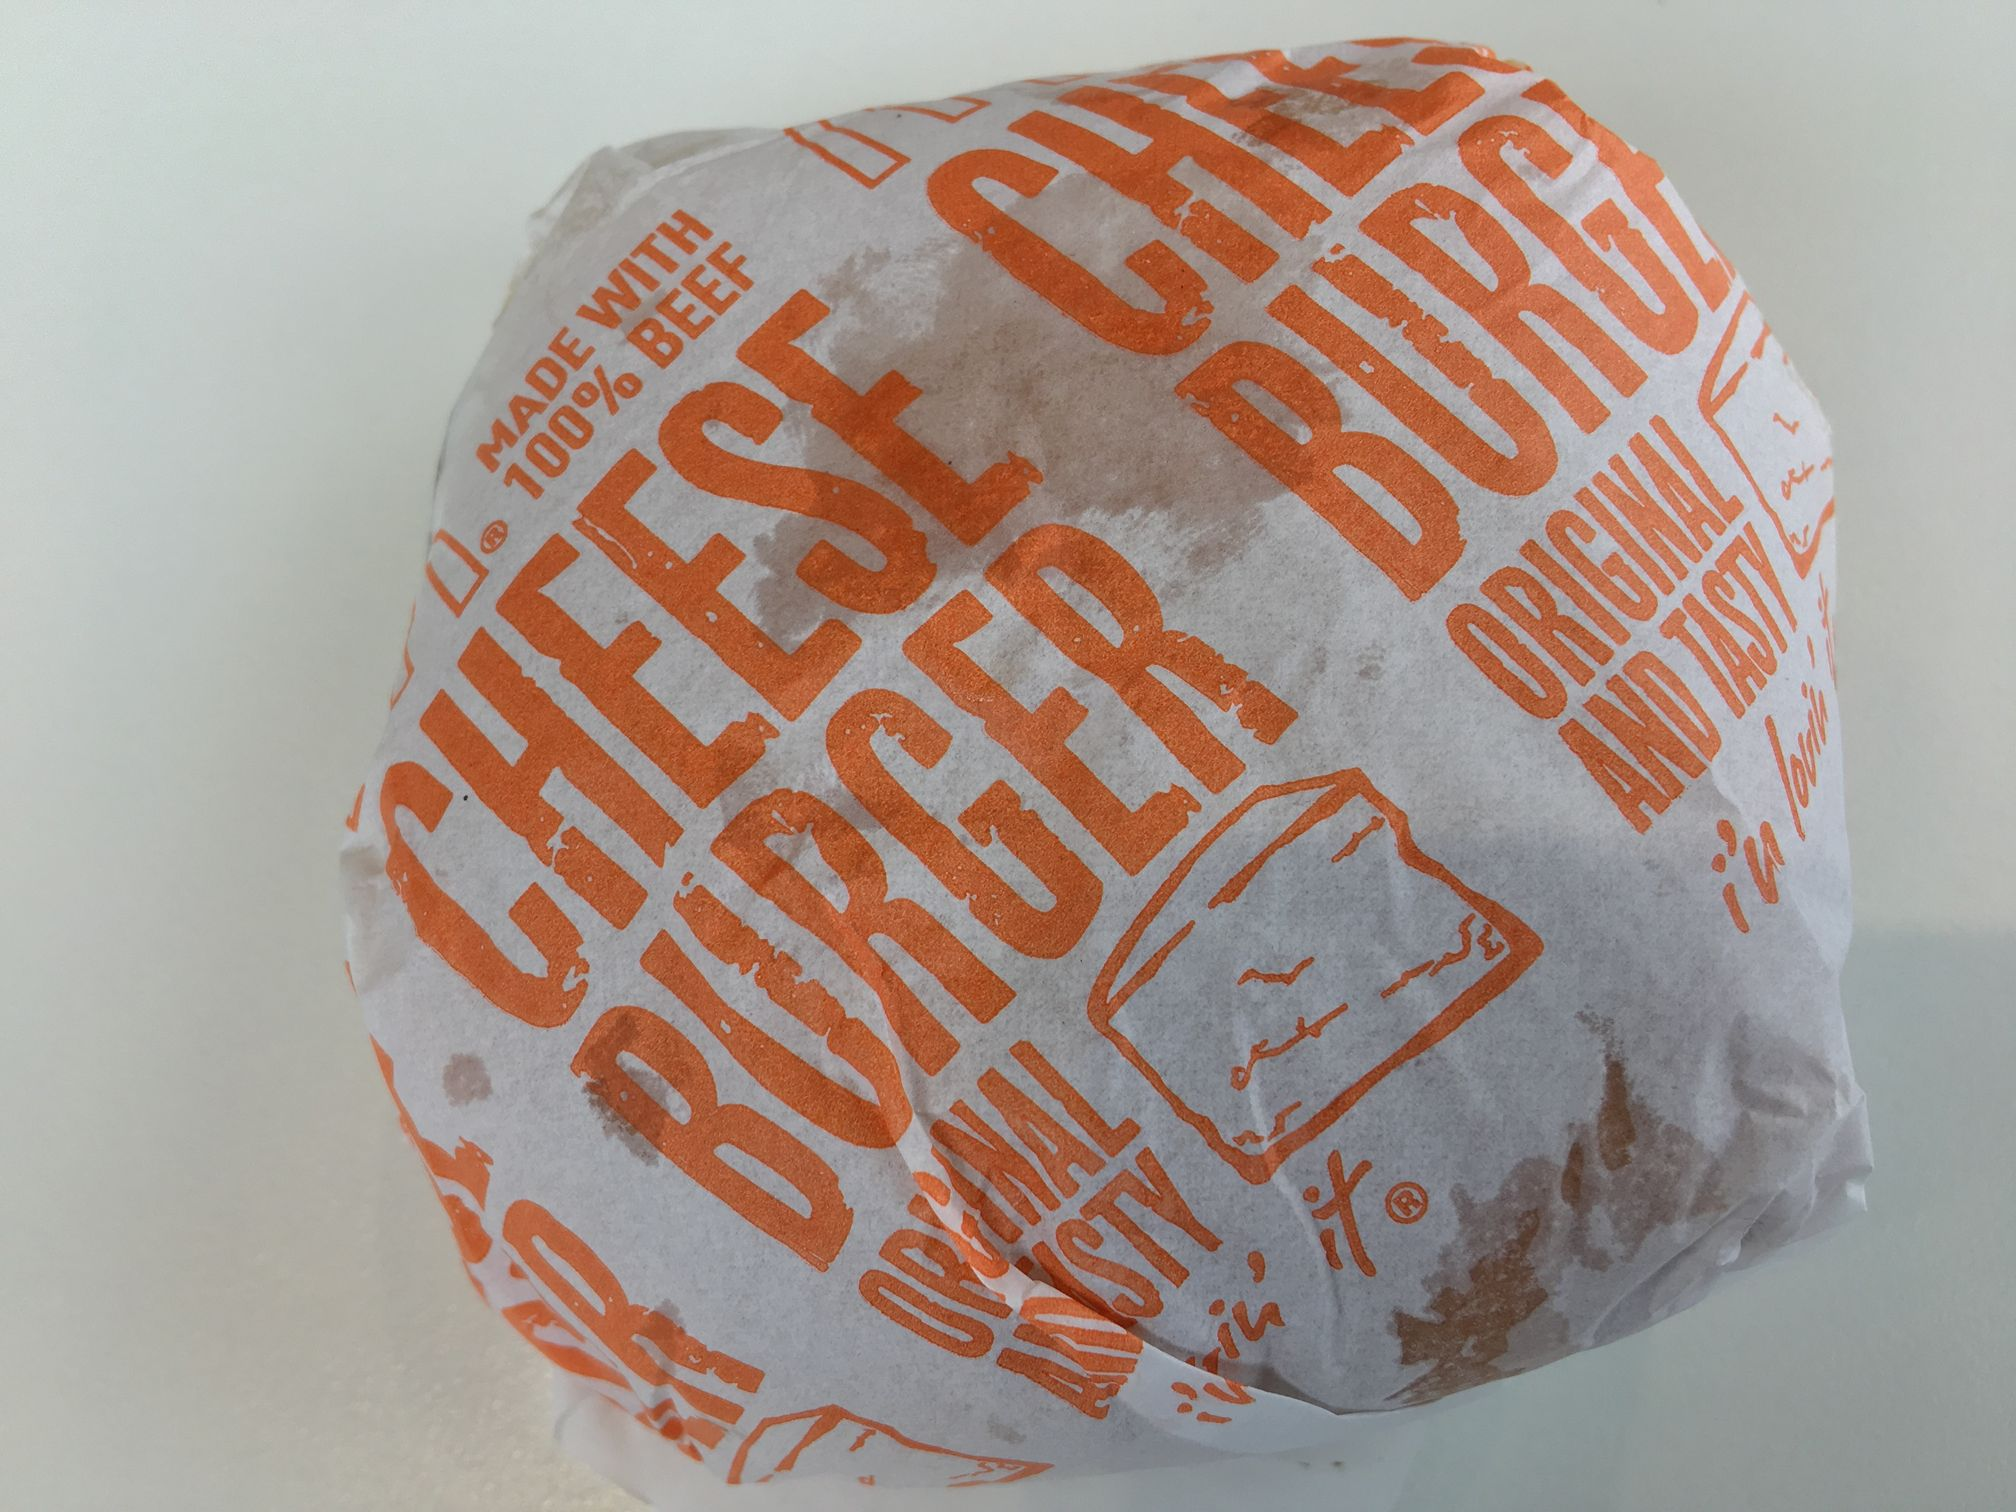 McDonald's Cheese Burger